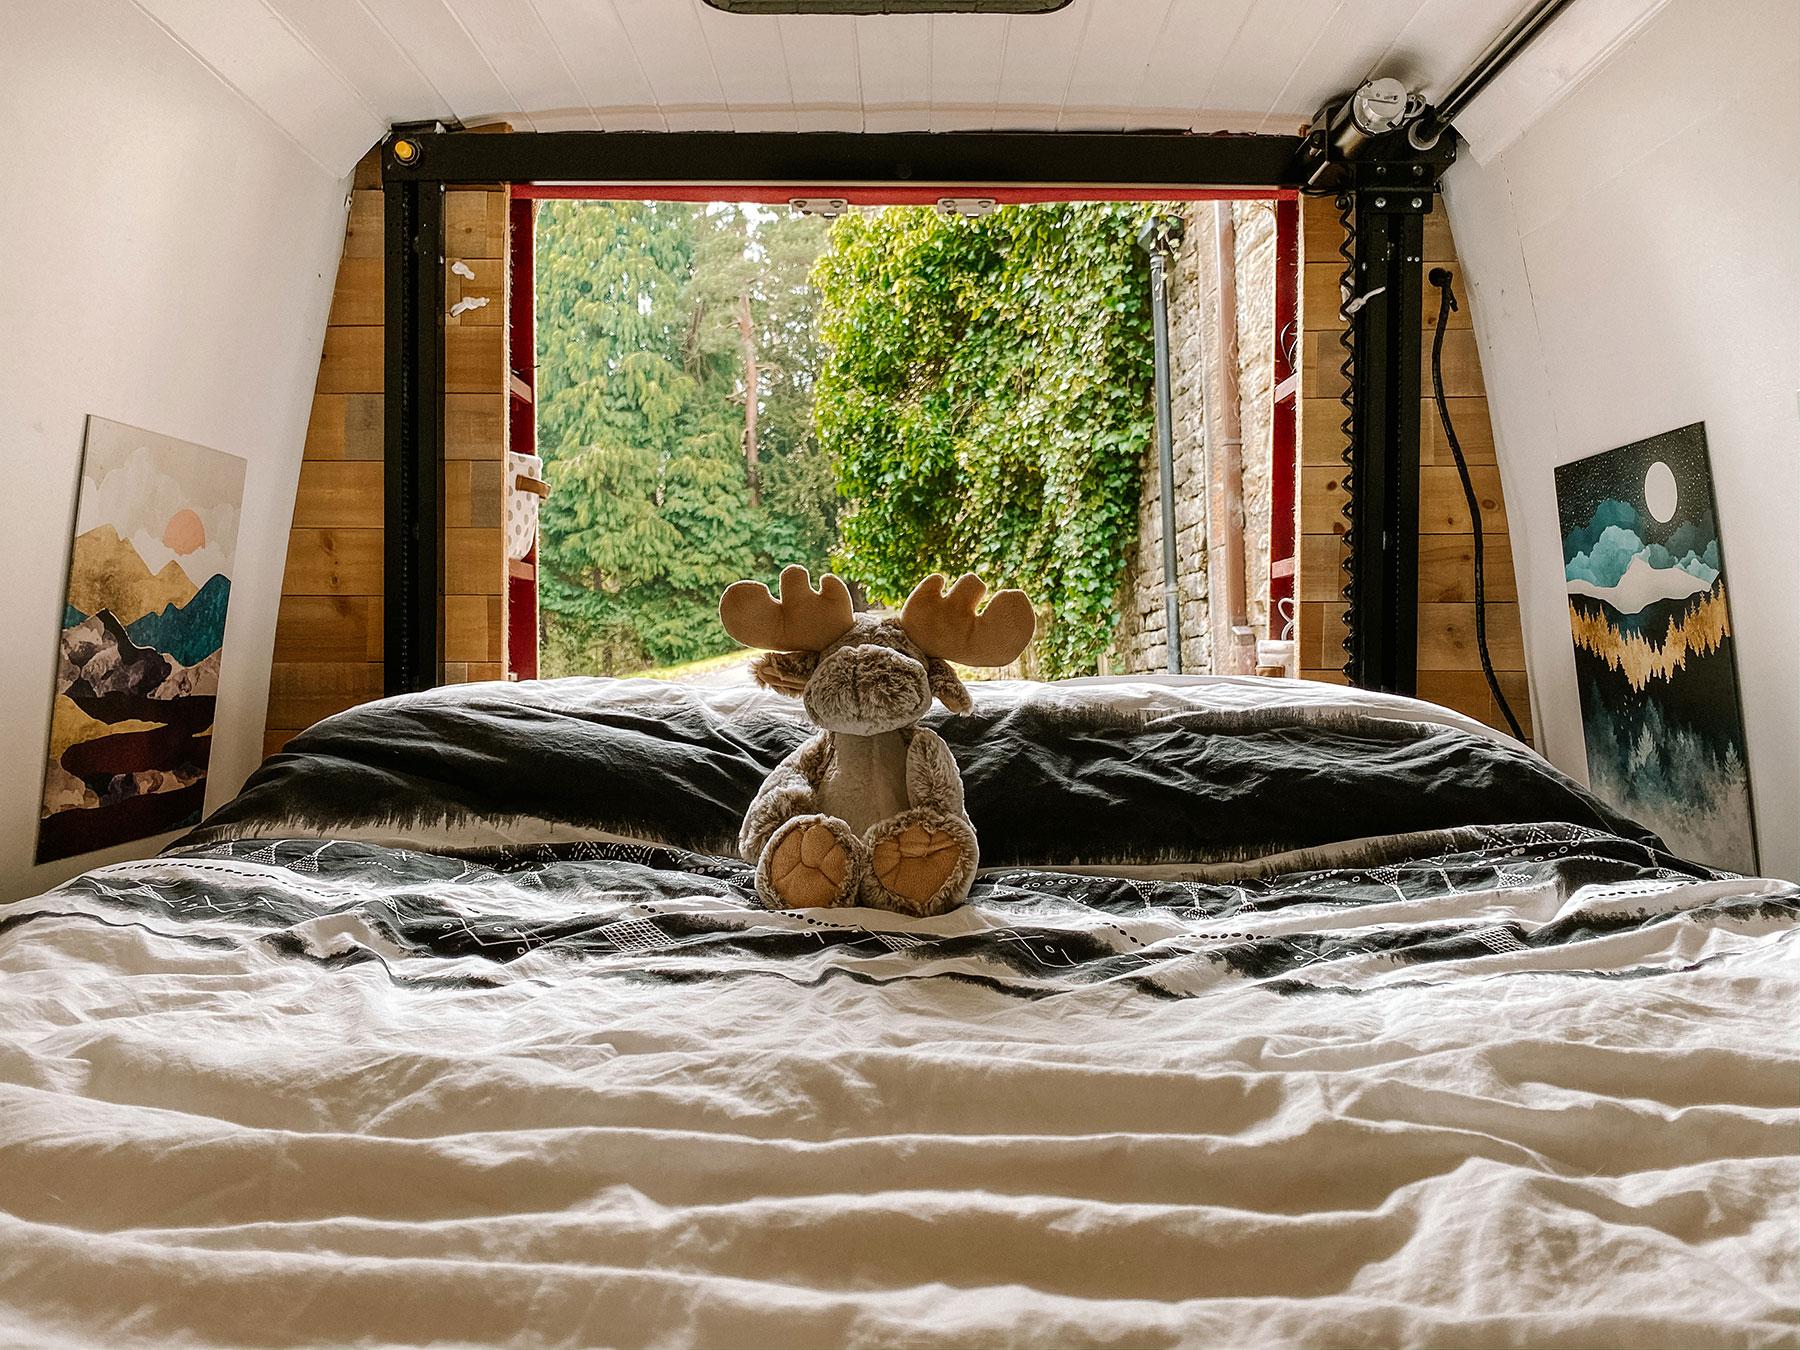 Happijac Bed Lift: Fast Facts!